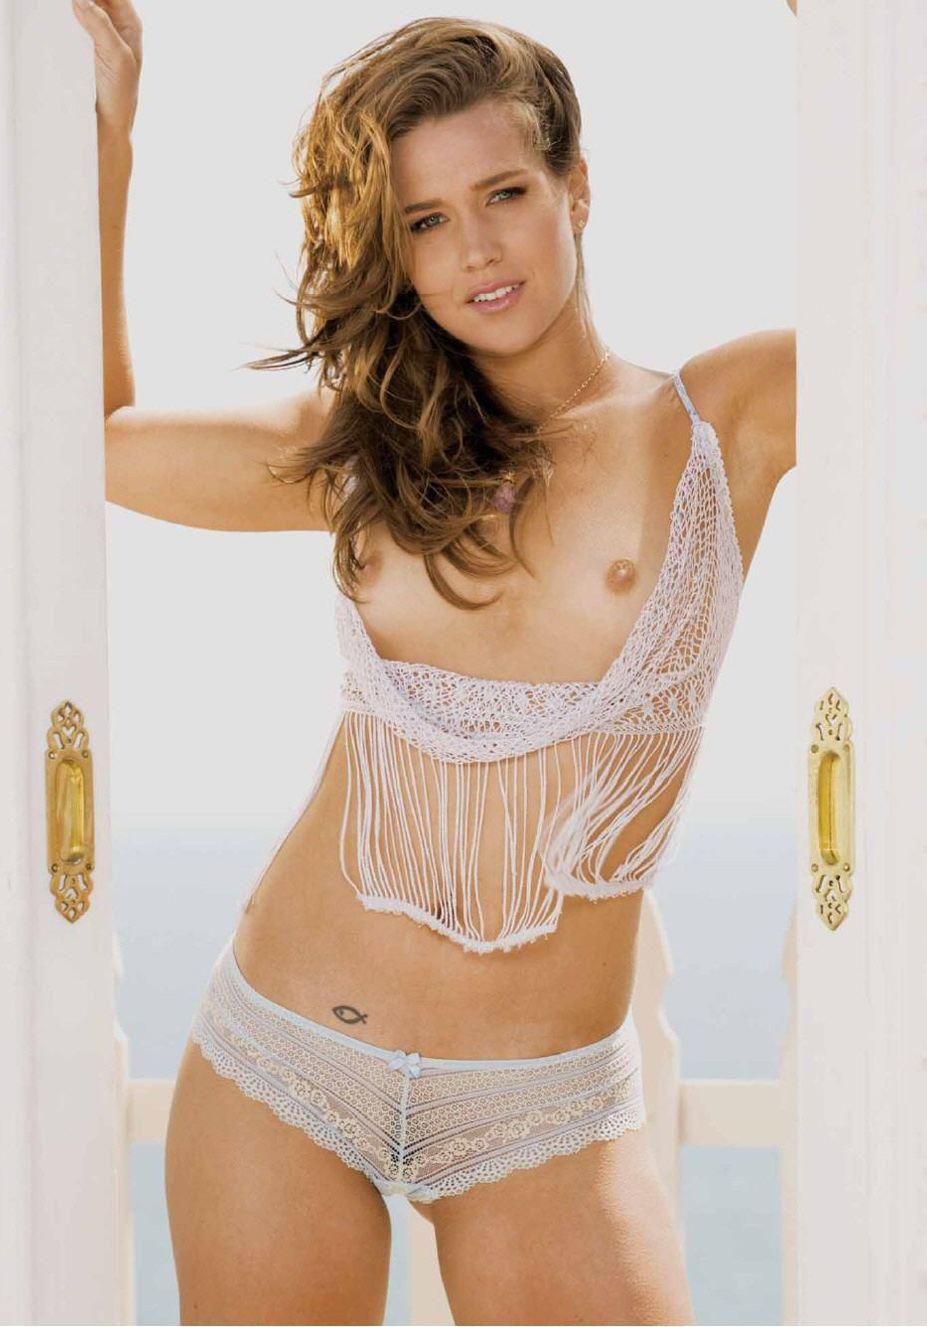 голая теннисистка Эшли Харклроуд / Ashley Harkleroad - Playboy USA august 2008